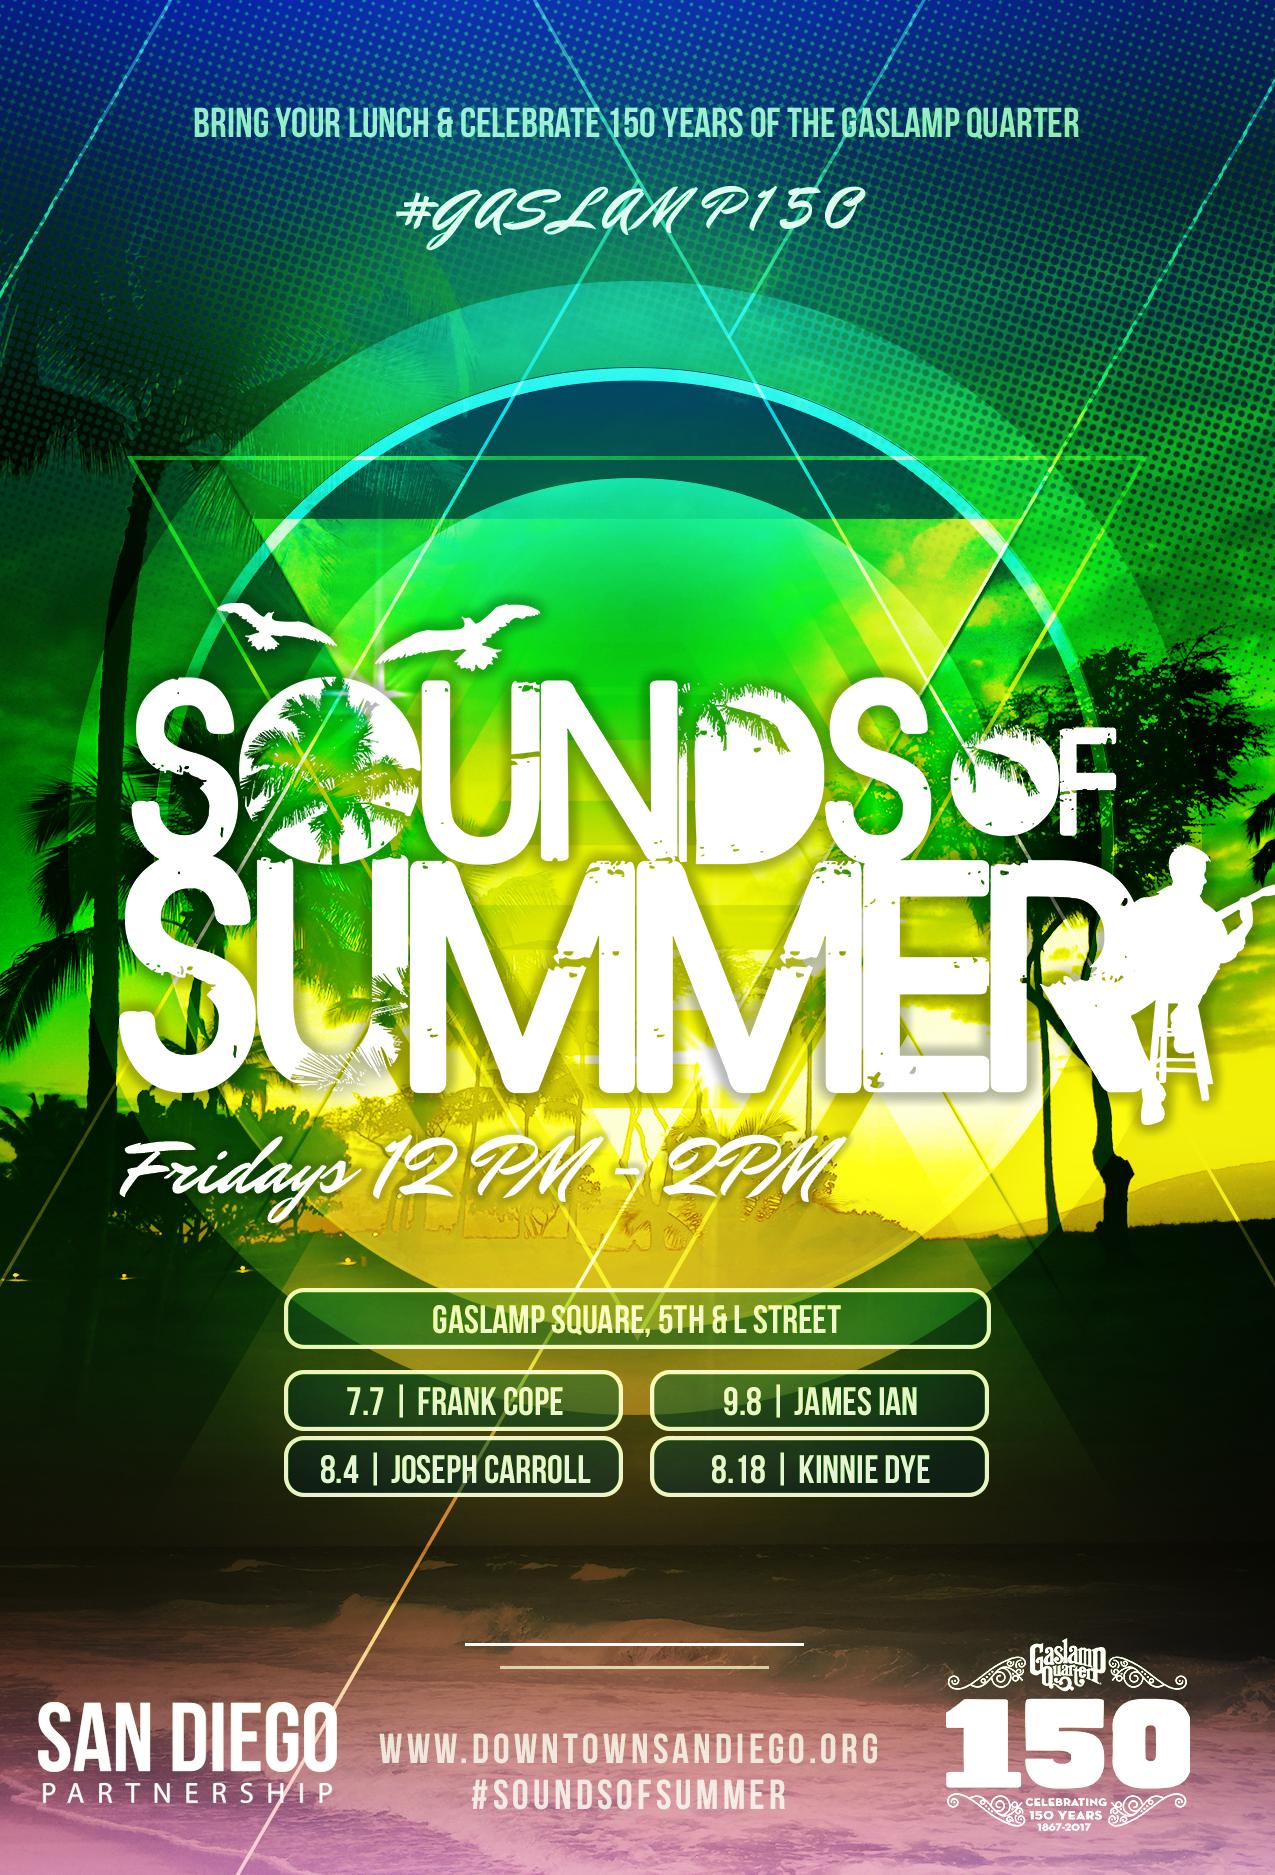 Sounds-of-Summer-Flyer_GQ gaslamp san diego